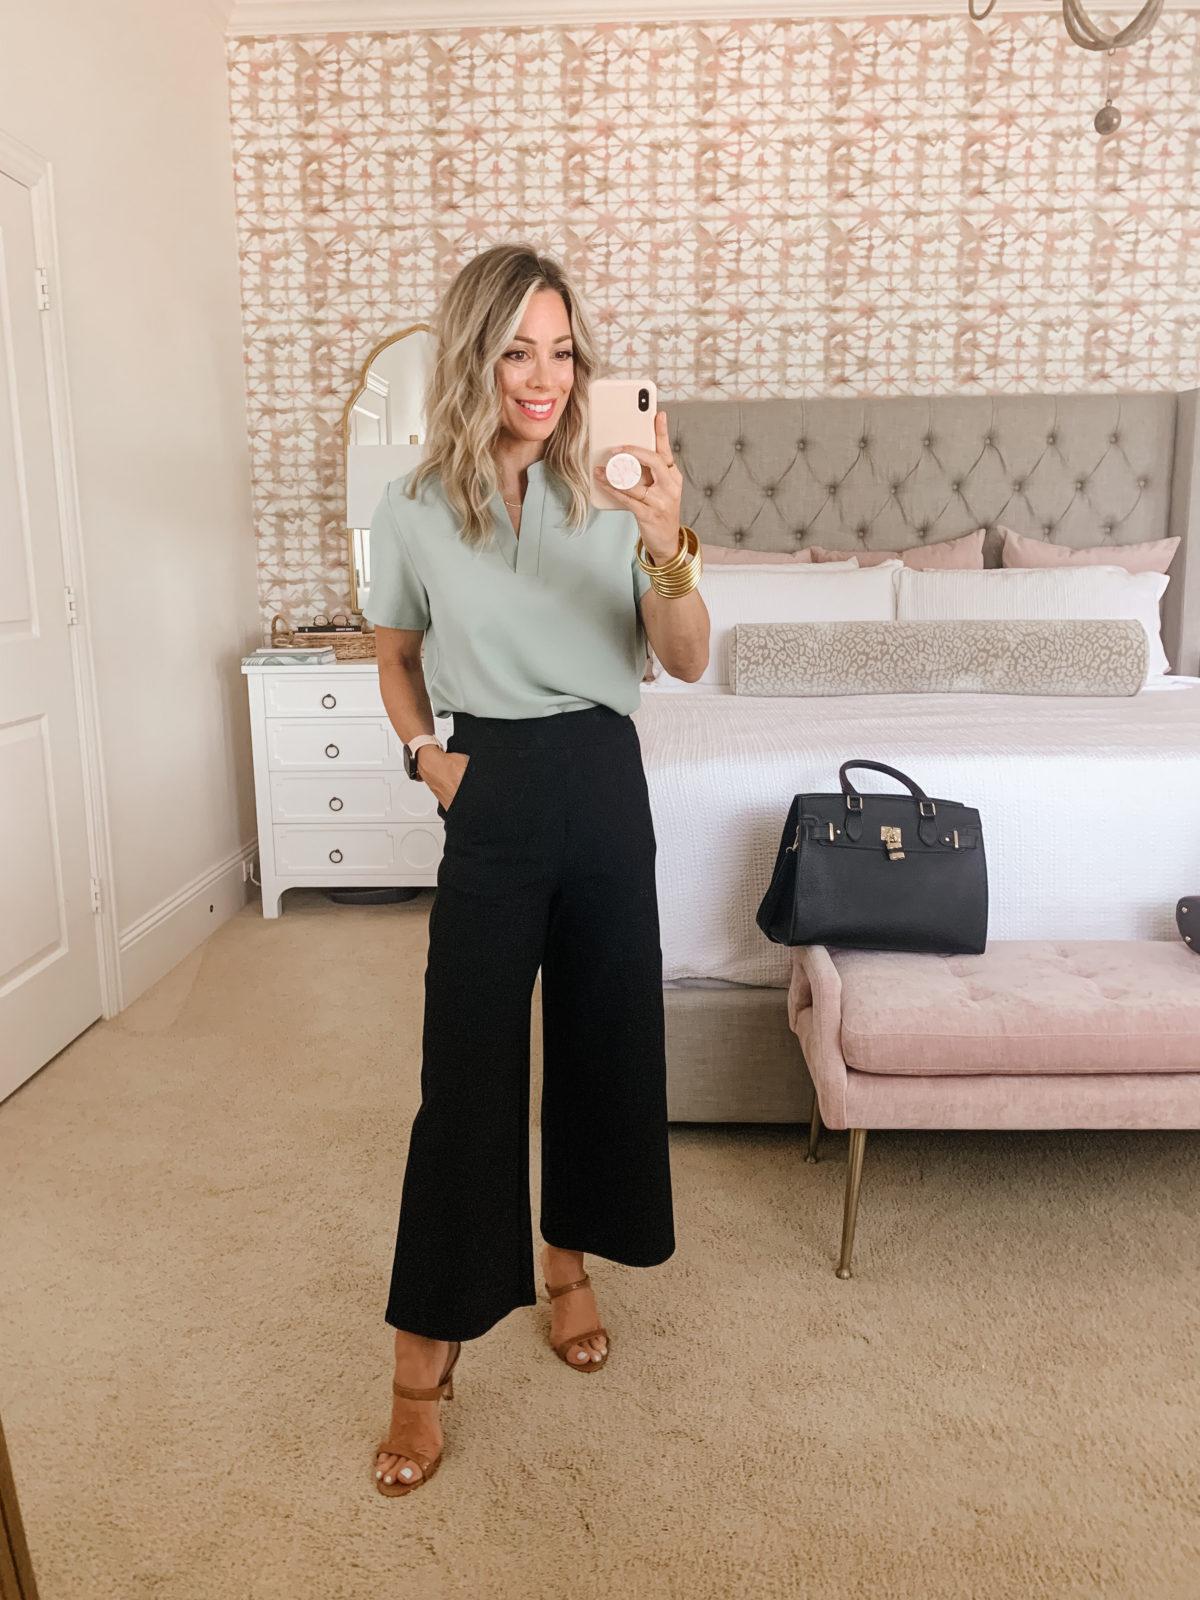 Amazon Fashion Faves, Top, Pants, Tote Bag